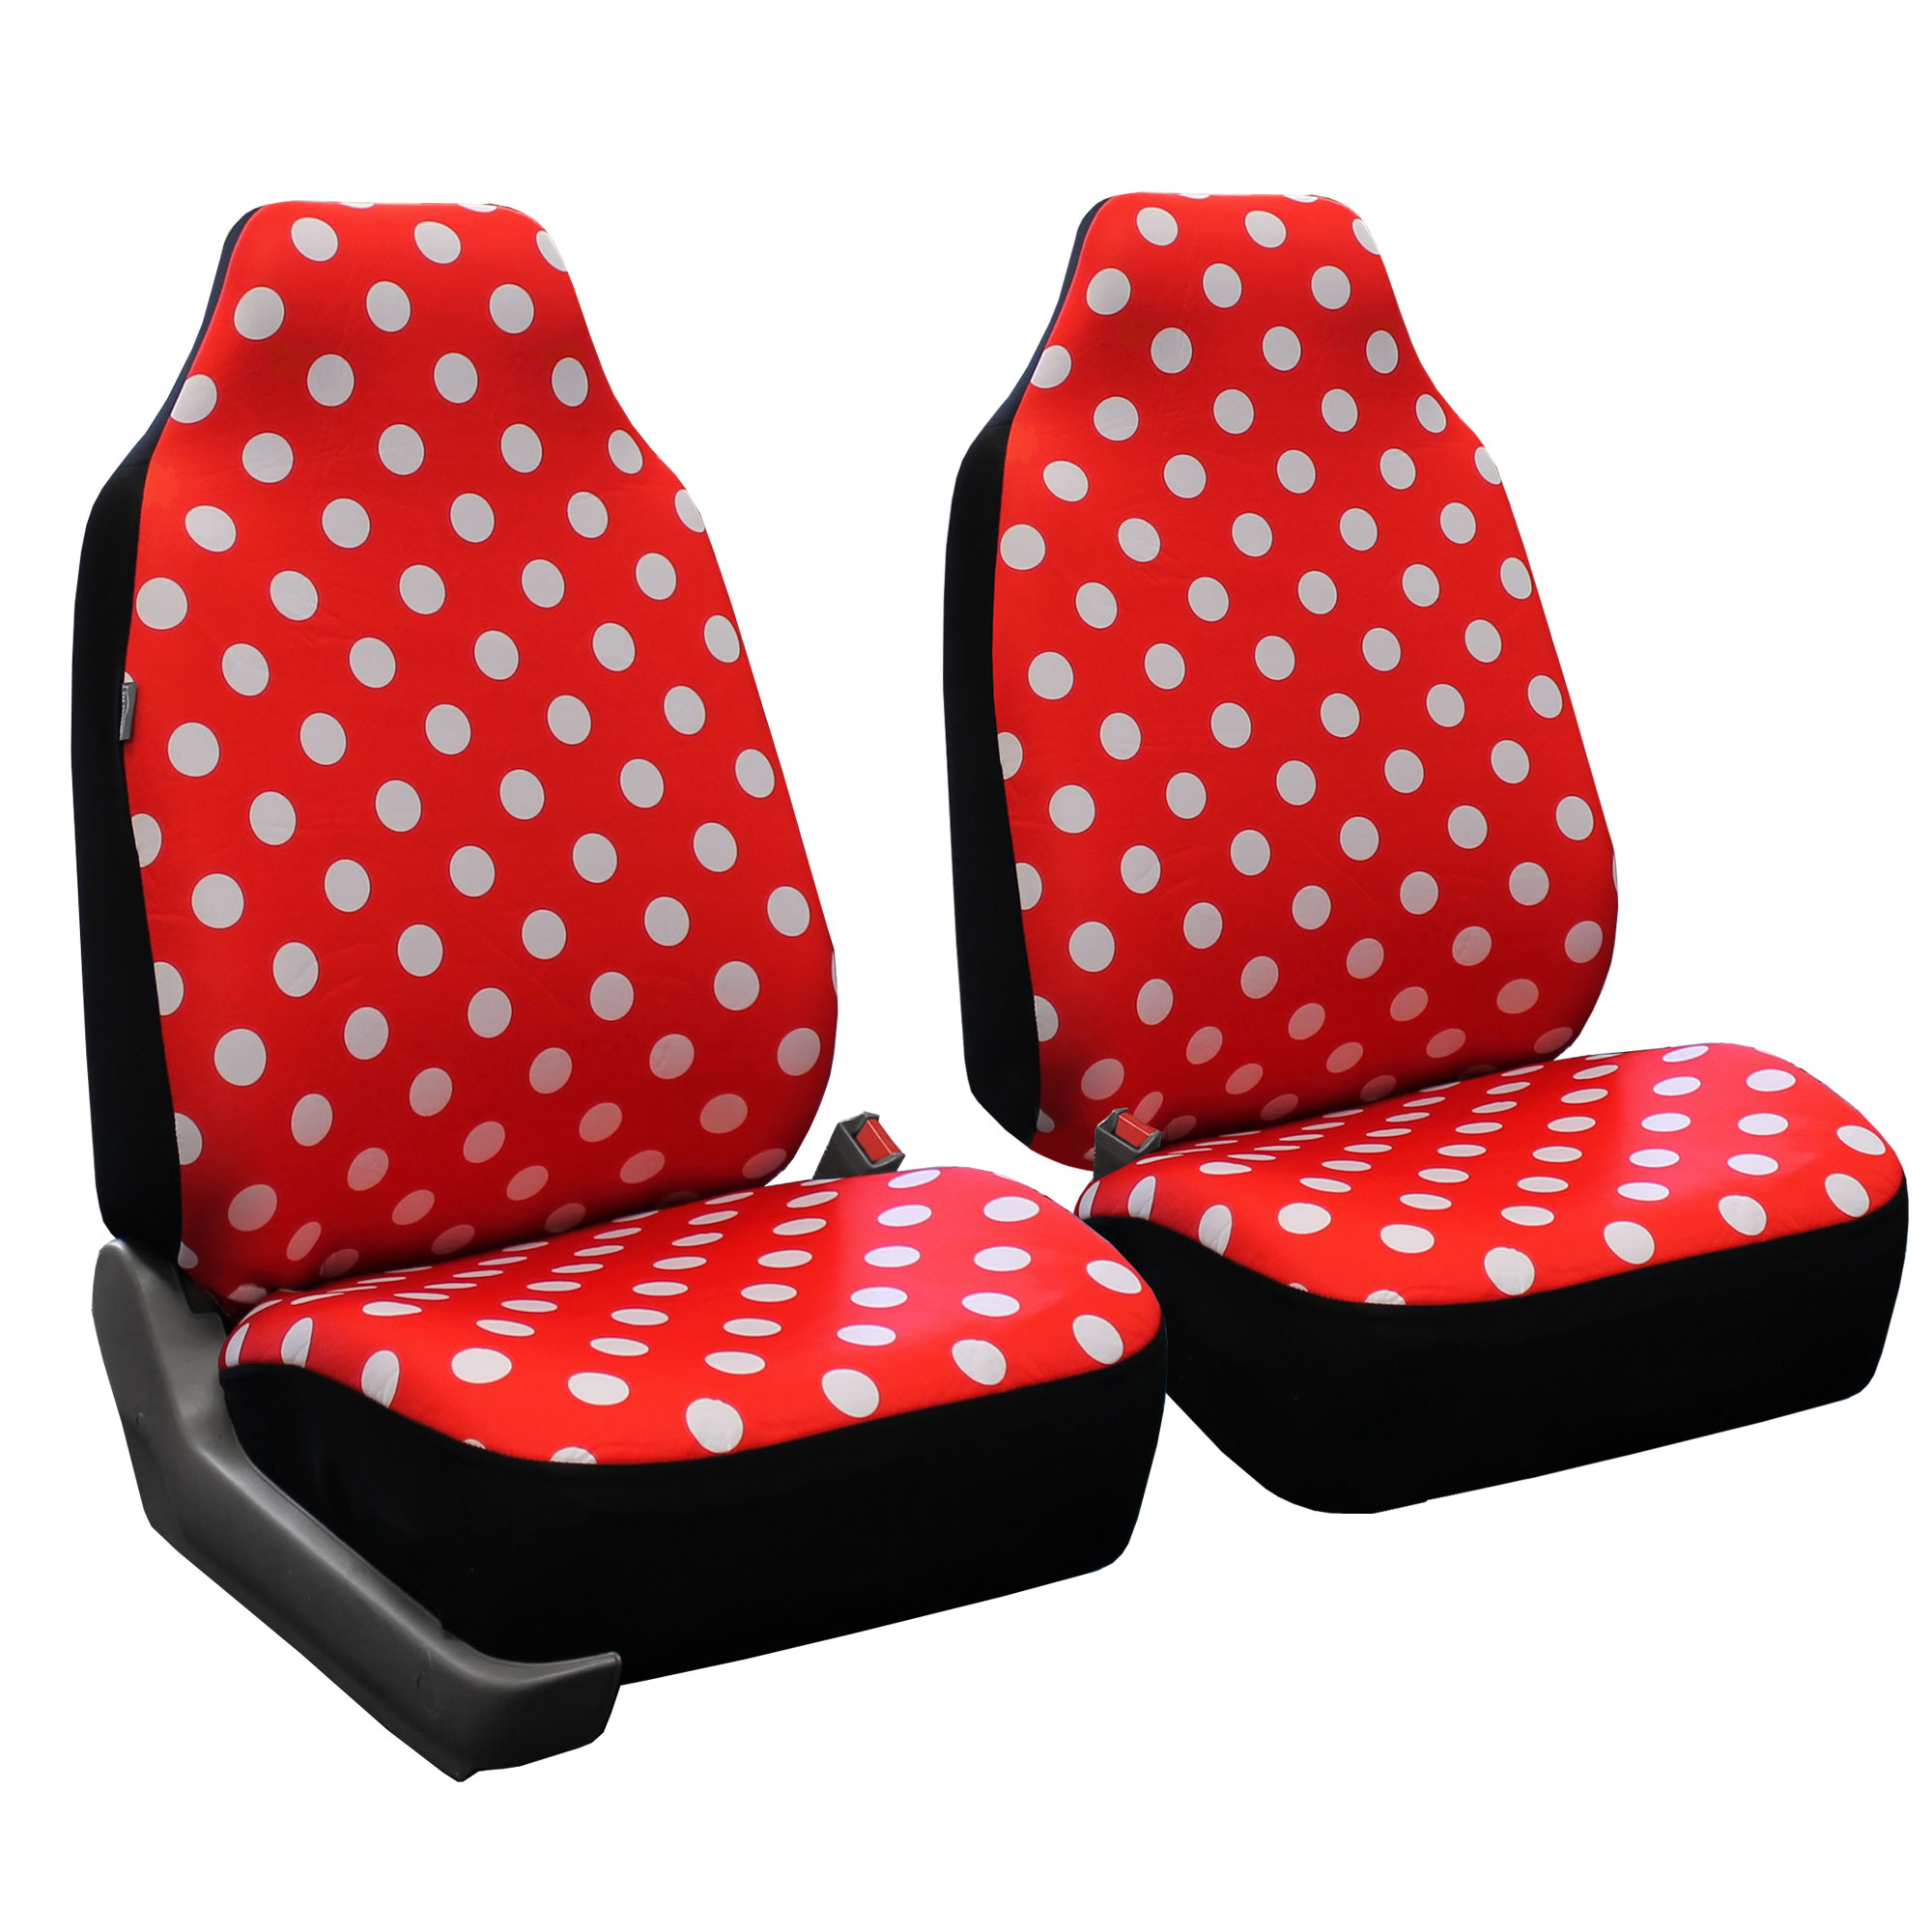 Flat Cloth Car Seat Covers